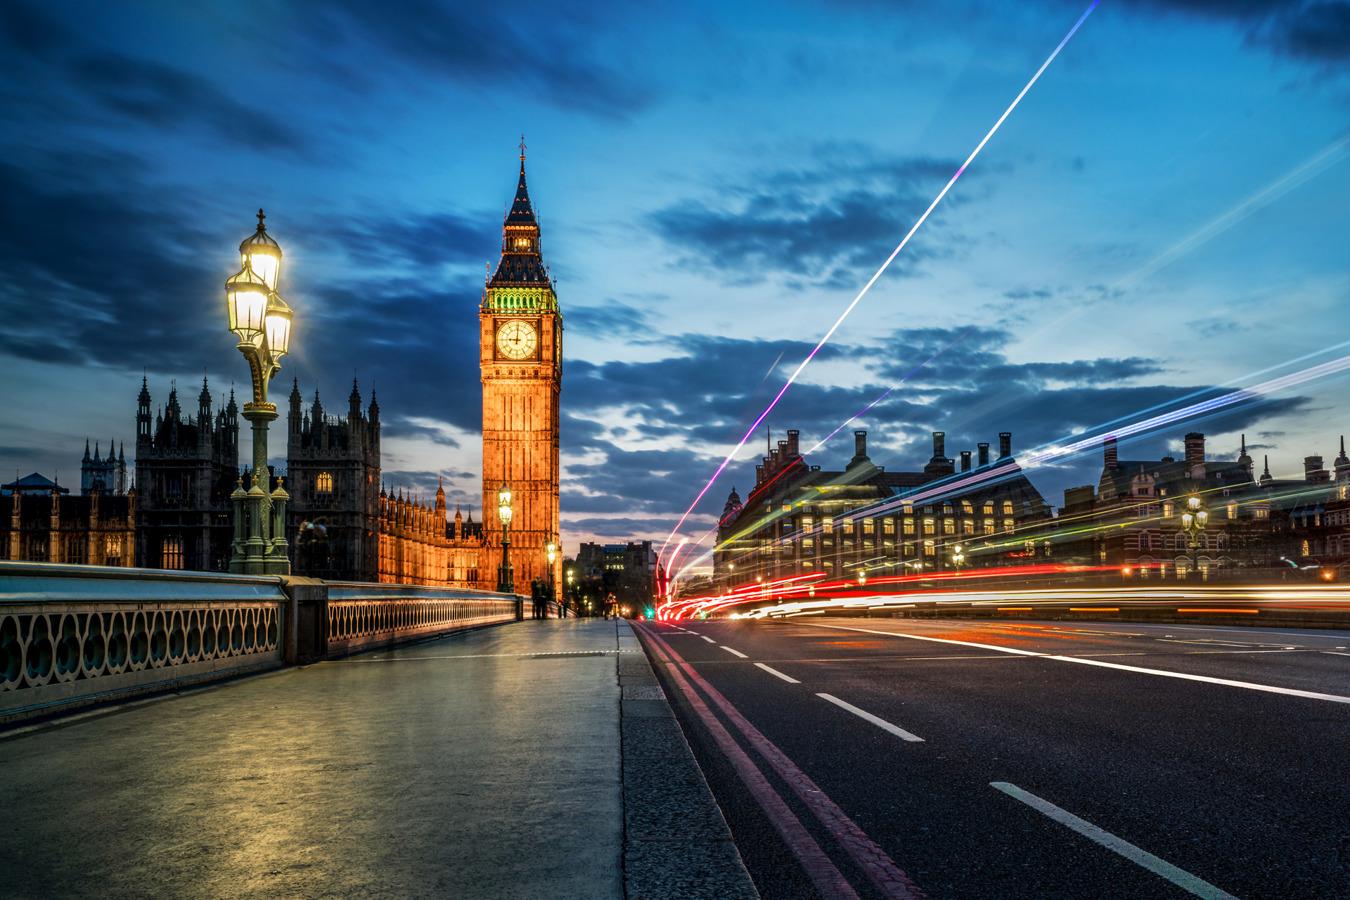 галушка лондон двигающаяся картинка нас метро